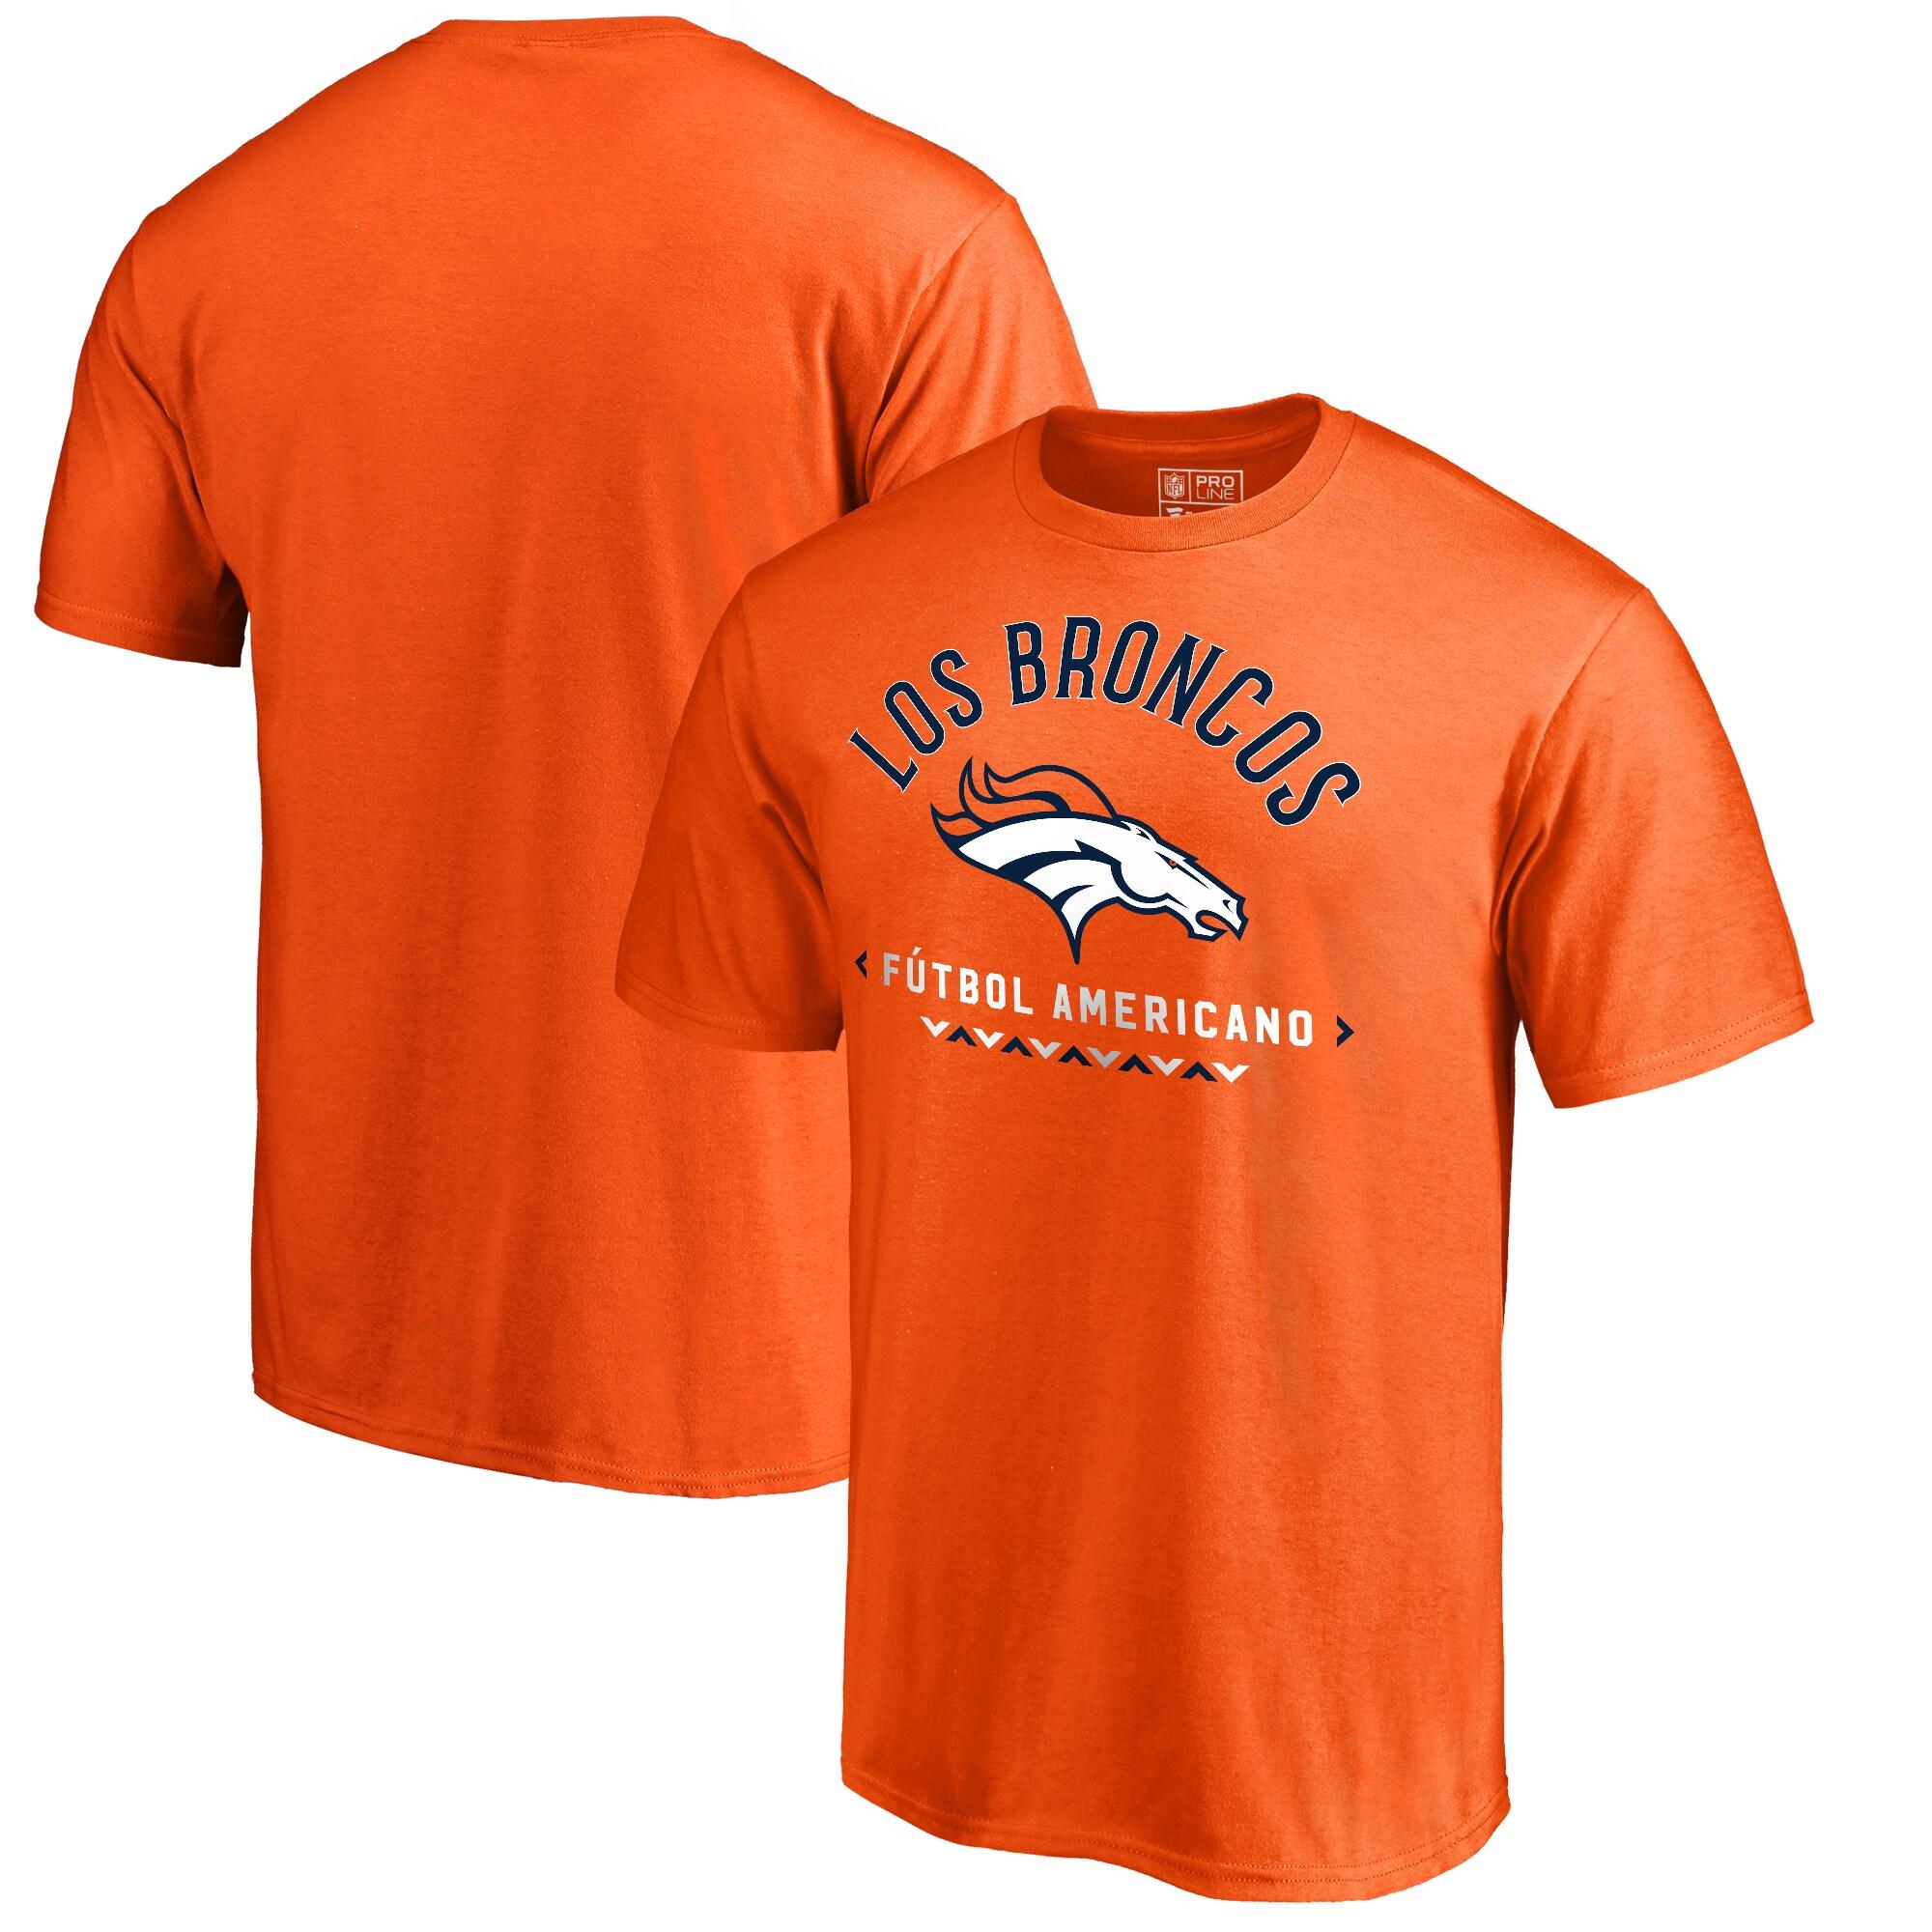 Denver Broncos NFL Pro Line by Fanatics Branded Futbol Americano Big & Tall T-Shirt - Orange